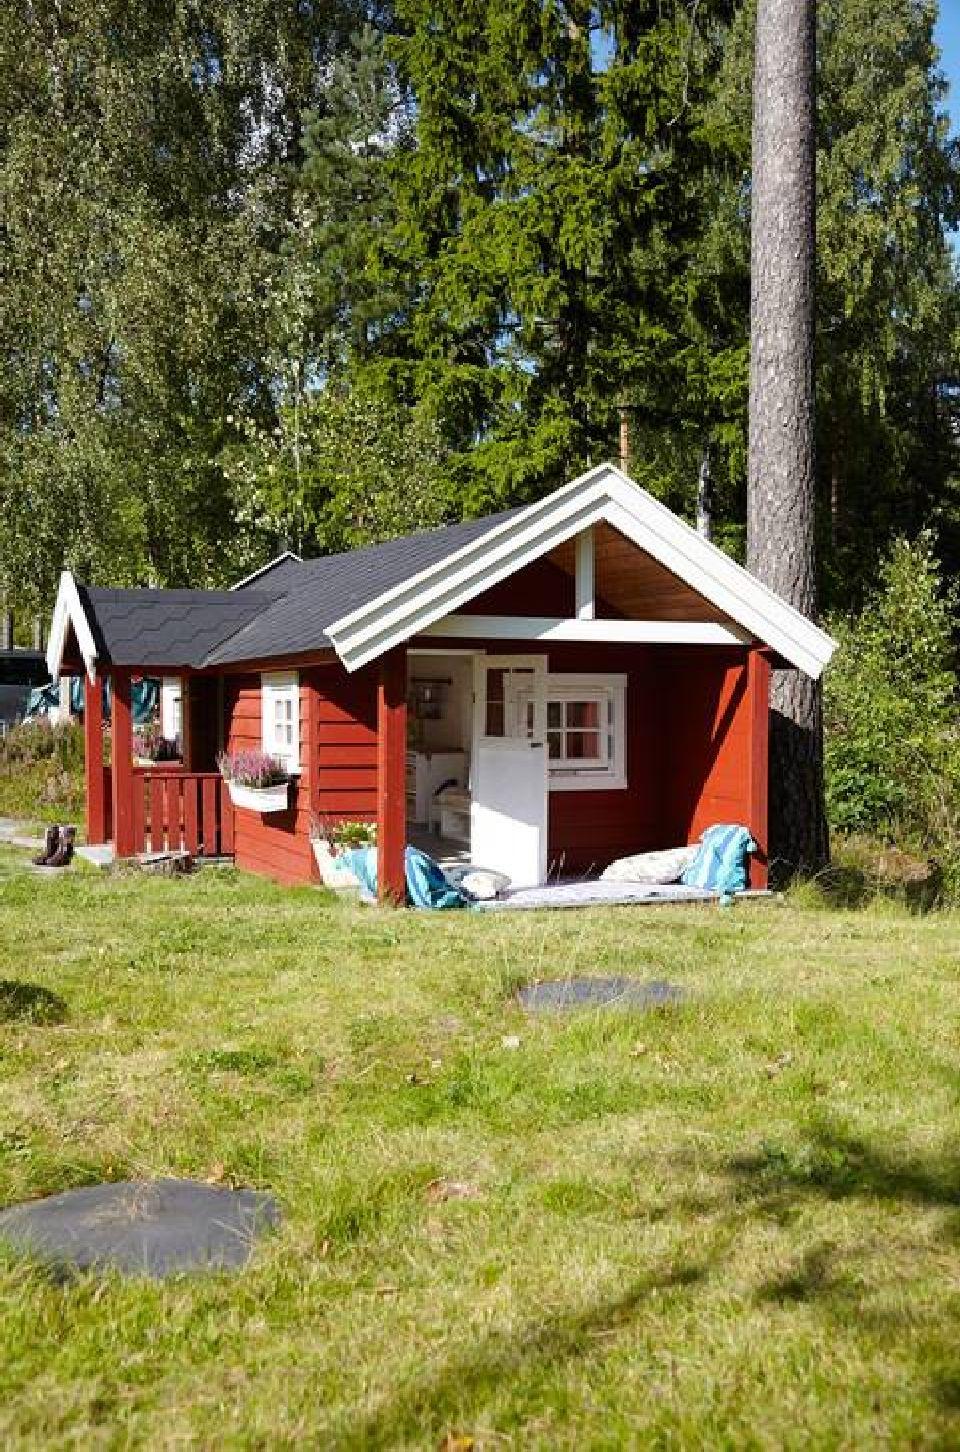 adelaparvu.com despre casuta de gradina pentru copii, Foto klikk.no, Per Erik Jaeger (4)